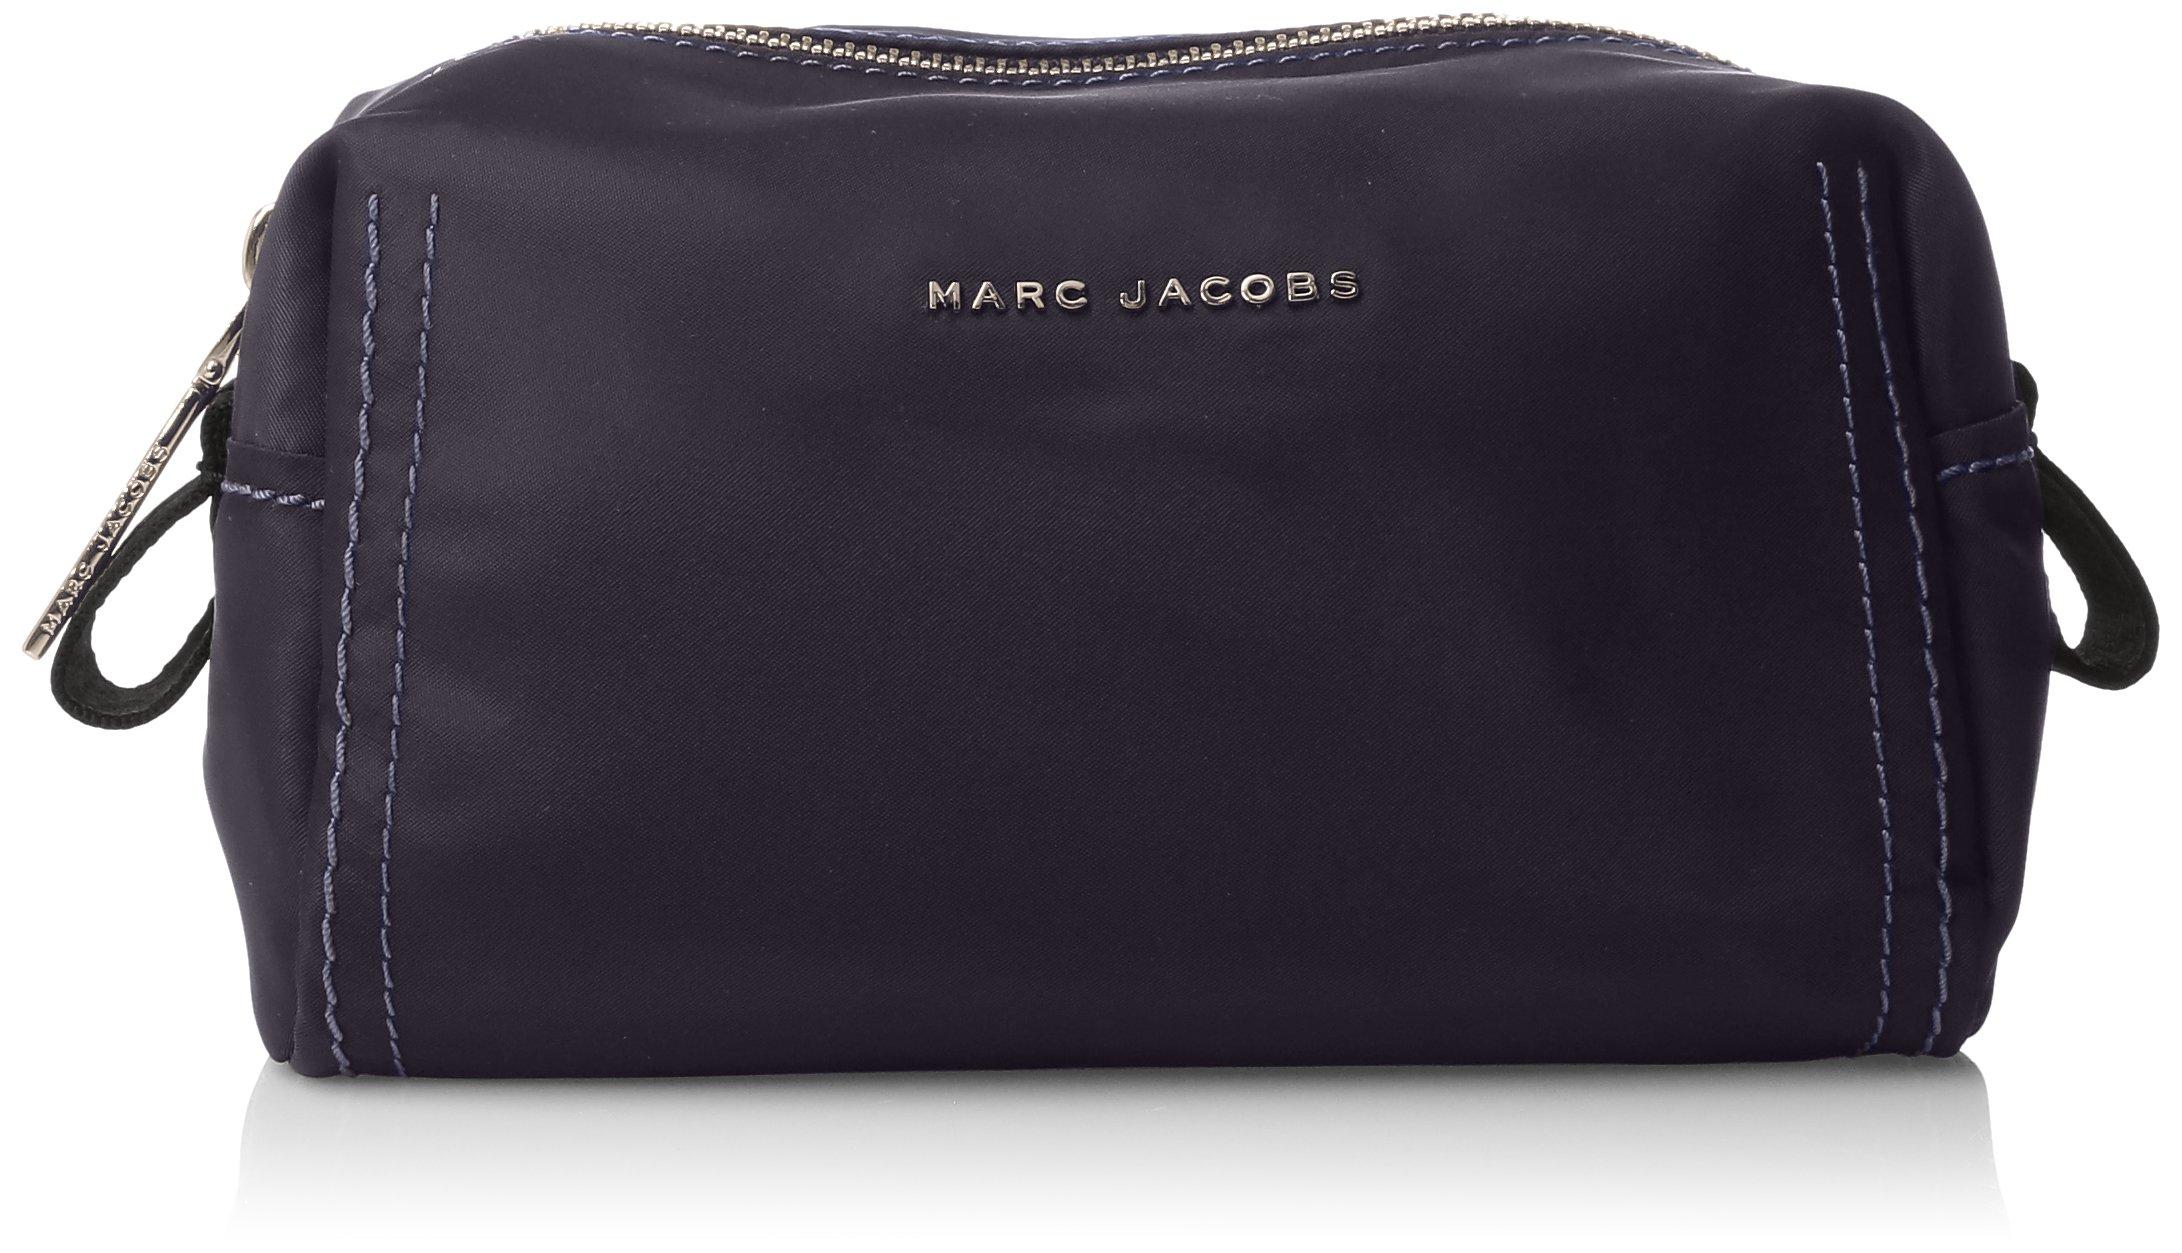 Marc Jacobs Large Easy Cosmetics Case, Amalfi Coast